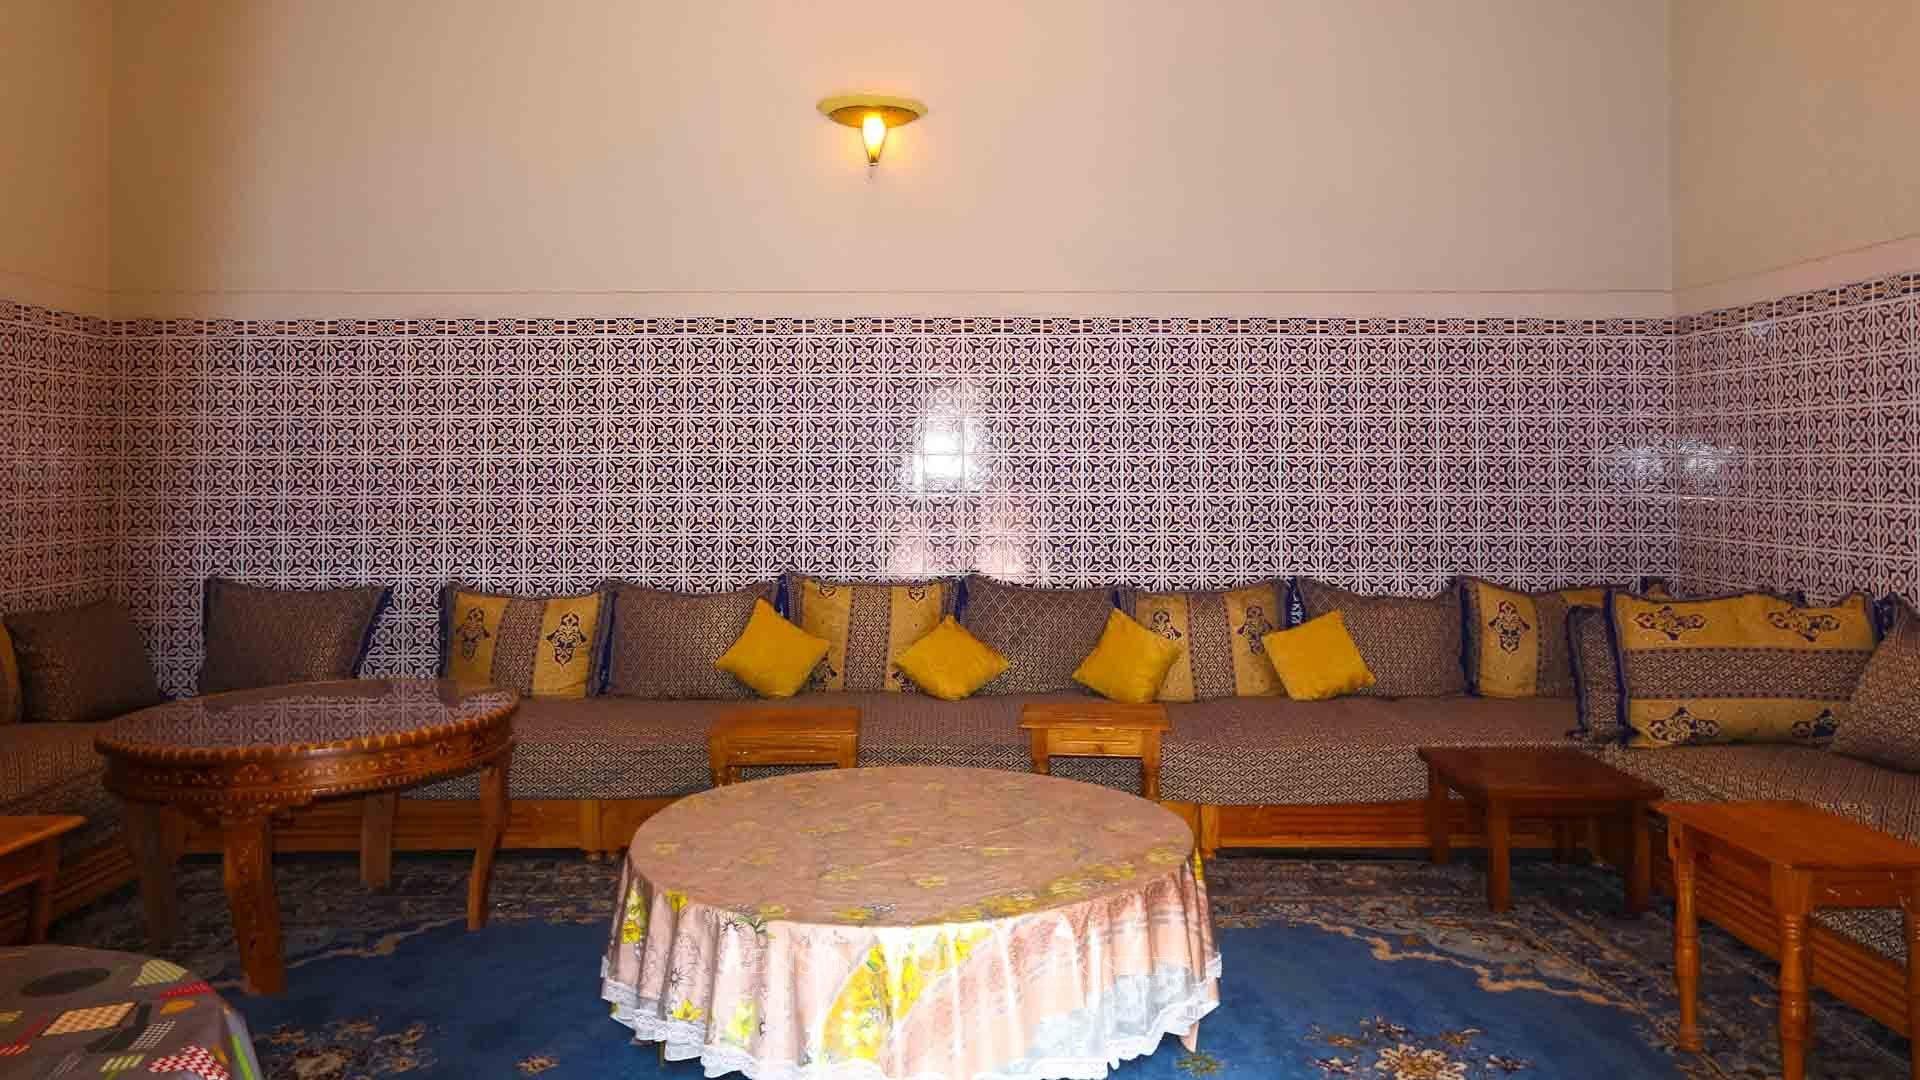 KPPM00958: Riad Ancha Riad Marrakech Morocco